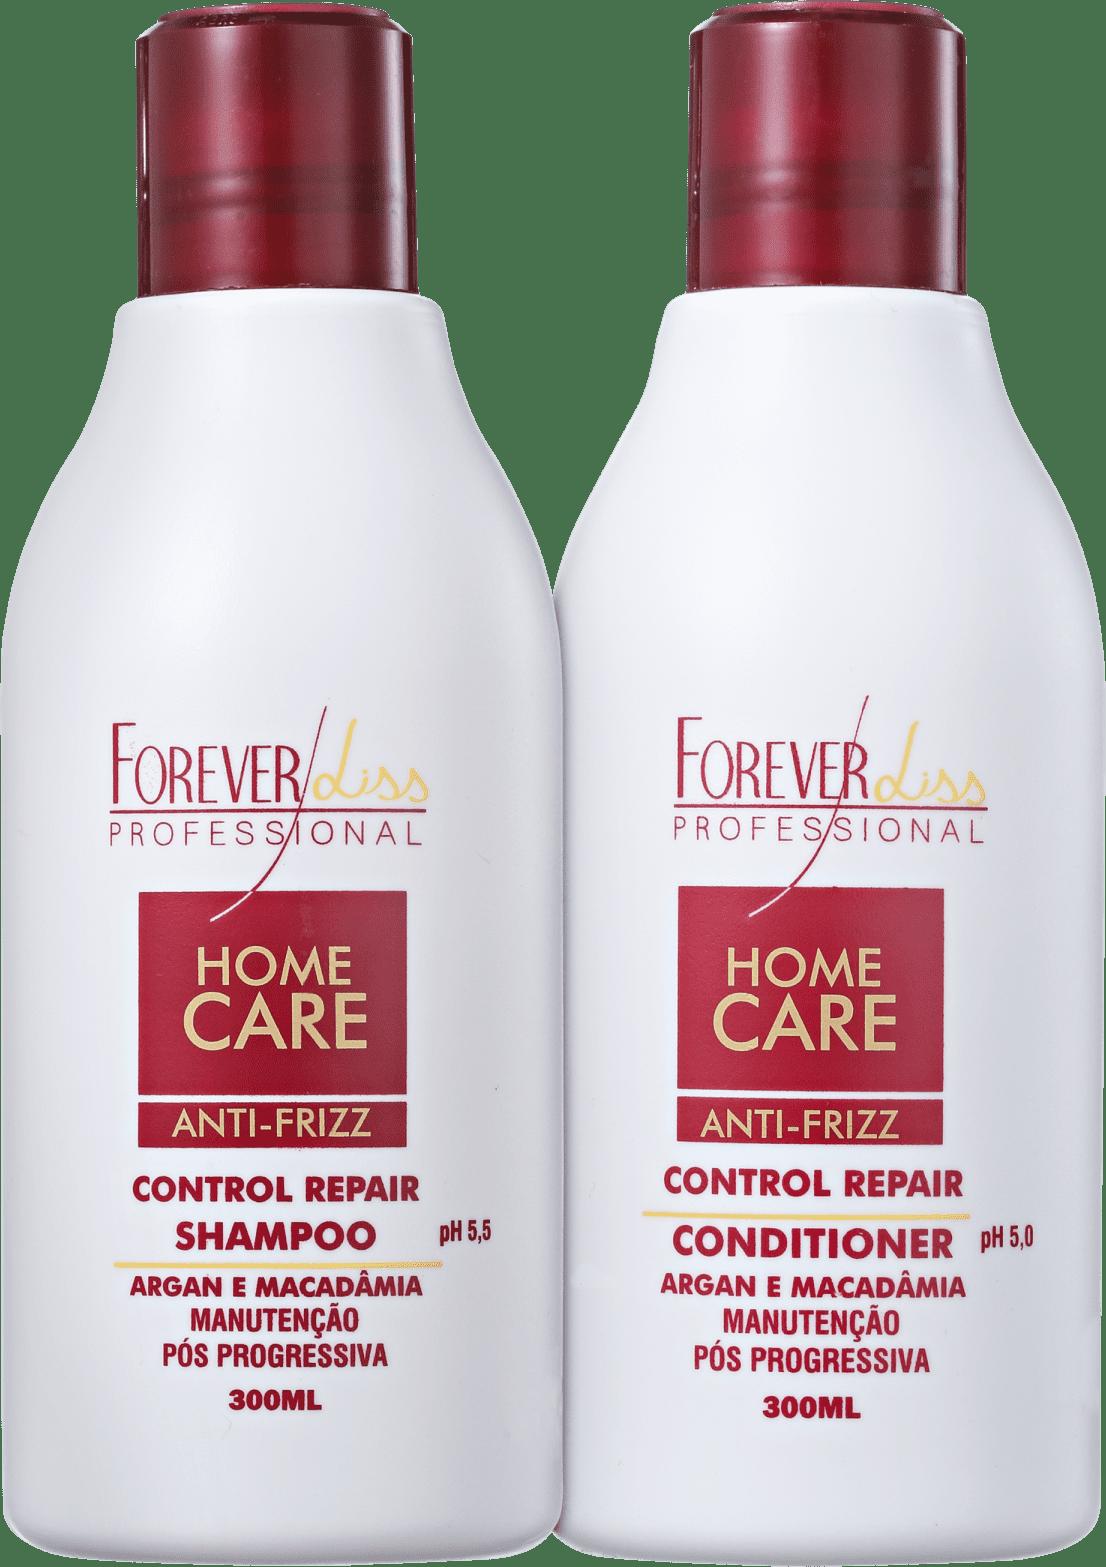 1d75a074c Kit Forever Liss Professional Home Care Anti-Frizz Pós-Progressiva (2  Produtos)